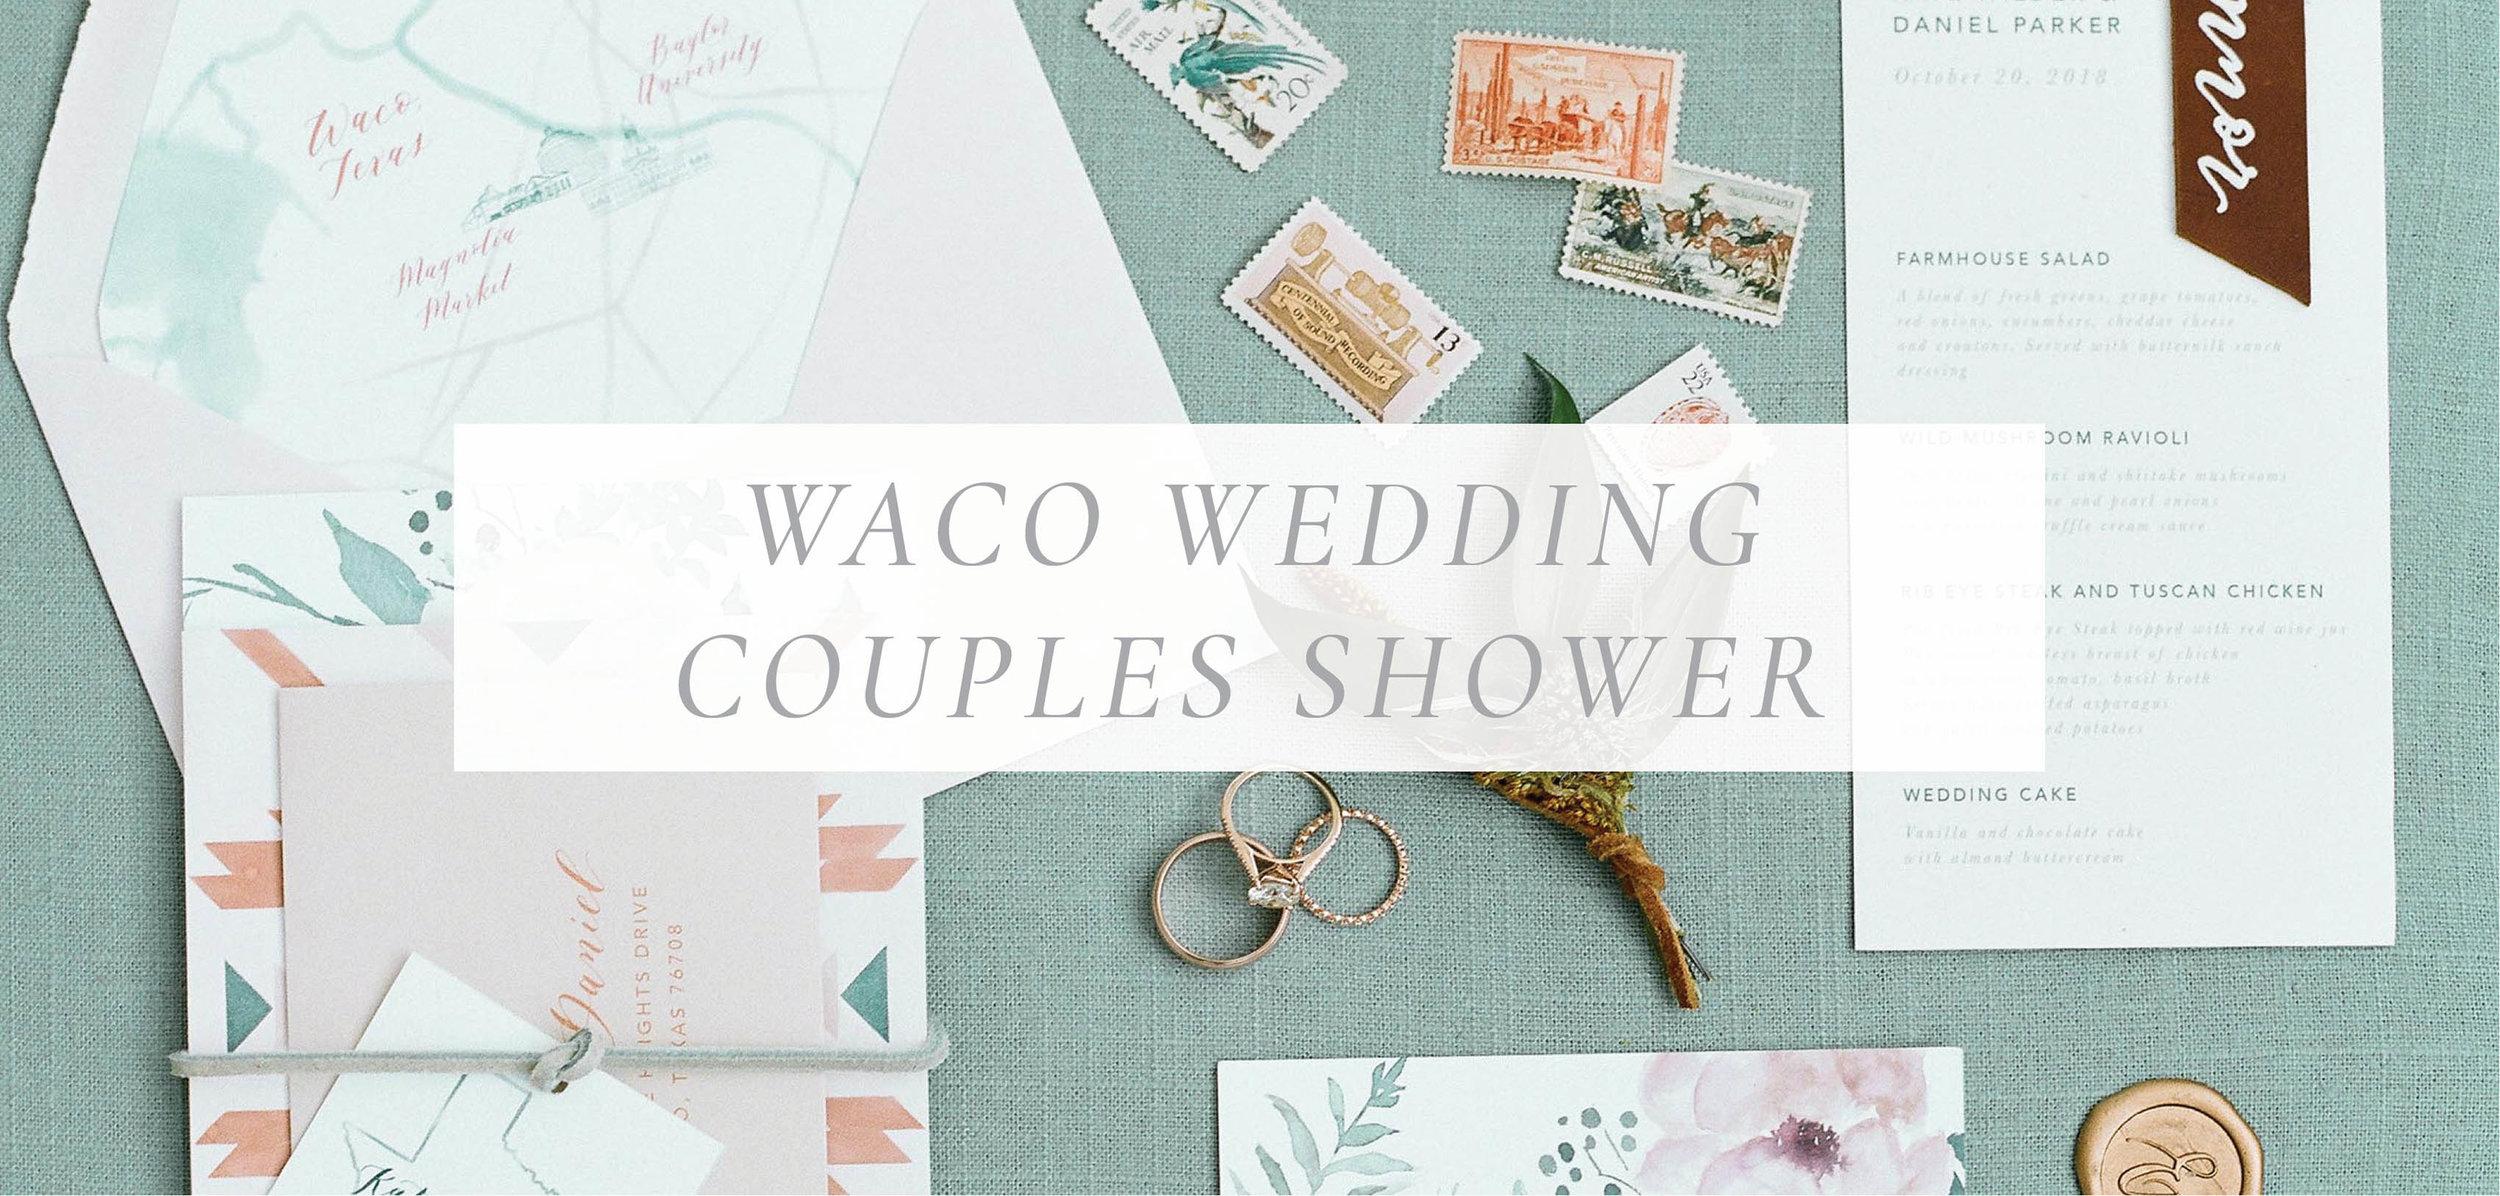 Waco Wedding Couples Shower.jpg